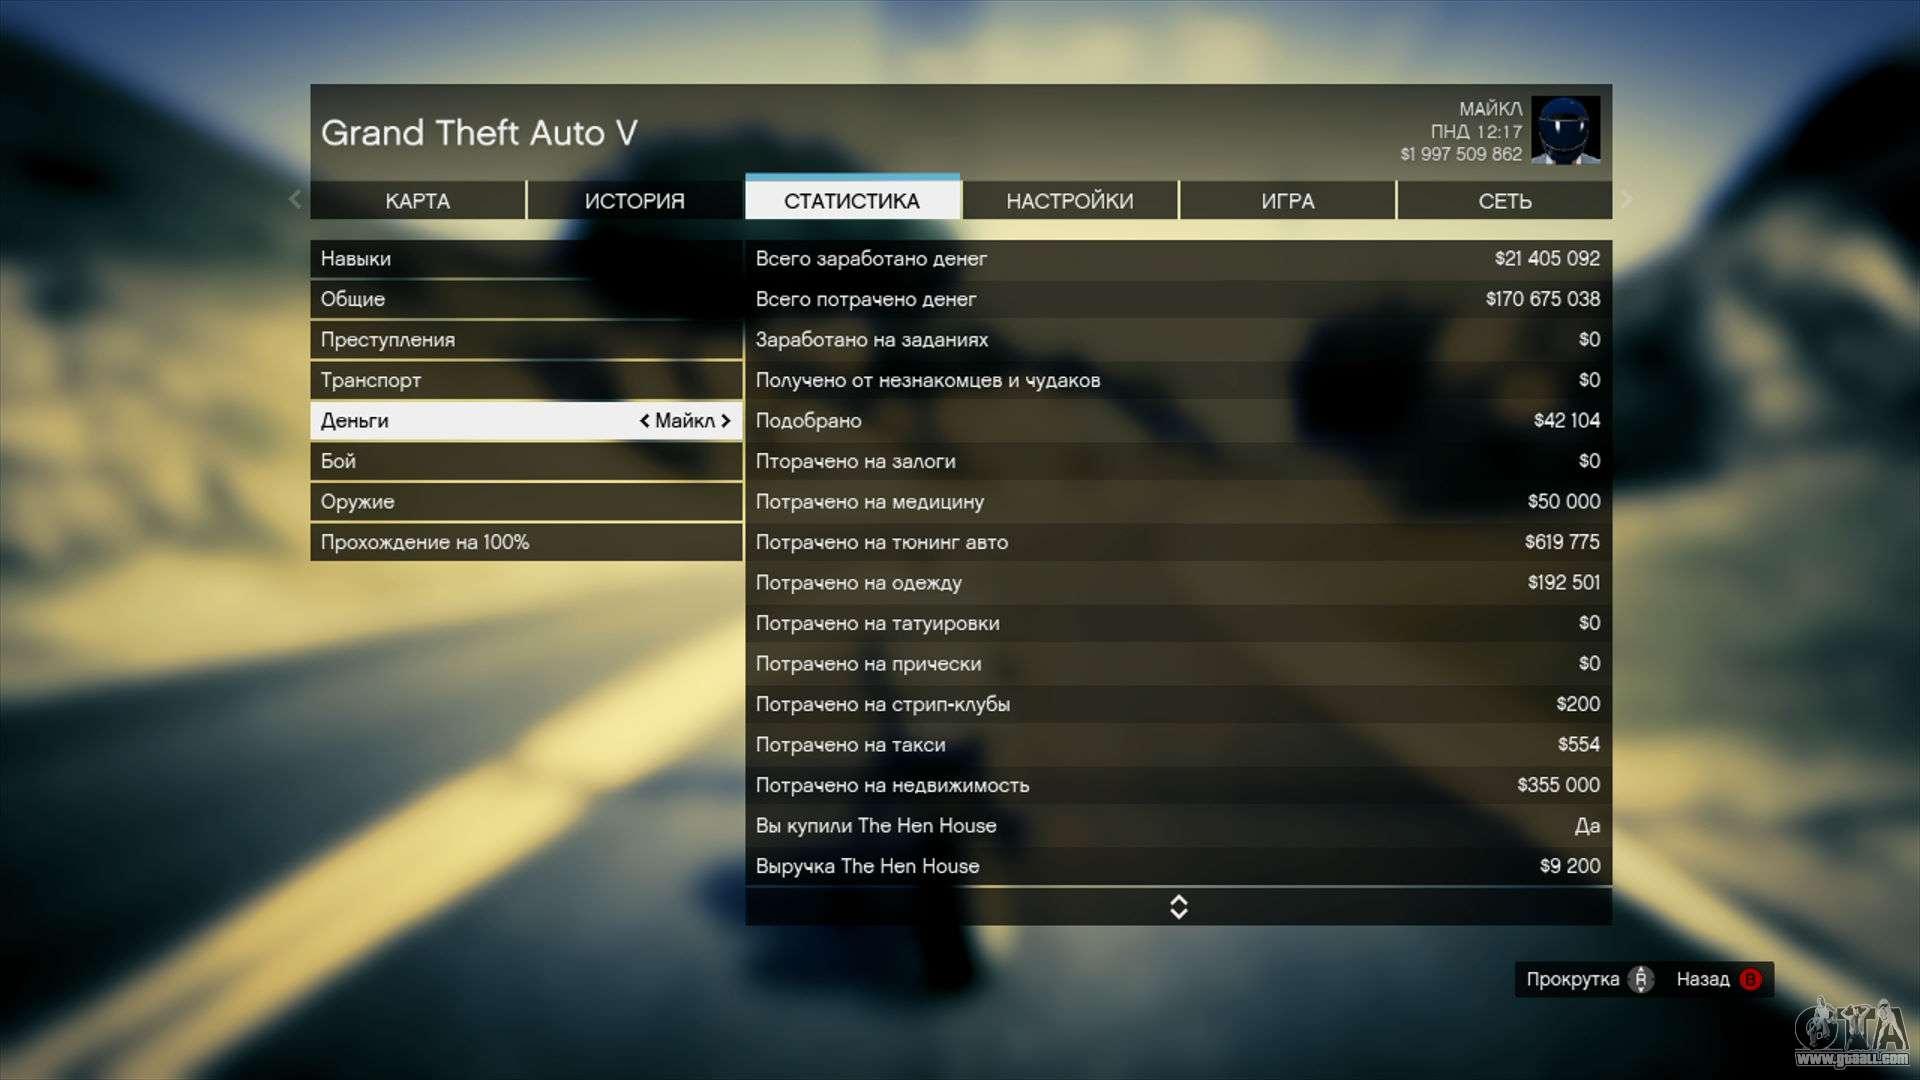 Save GTA 5 100% and 1 billion Xbox 360 for GTA 5